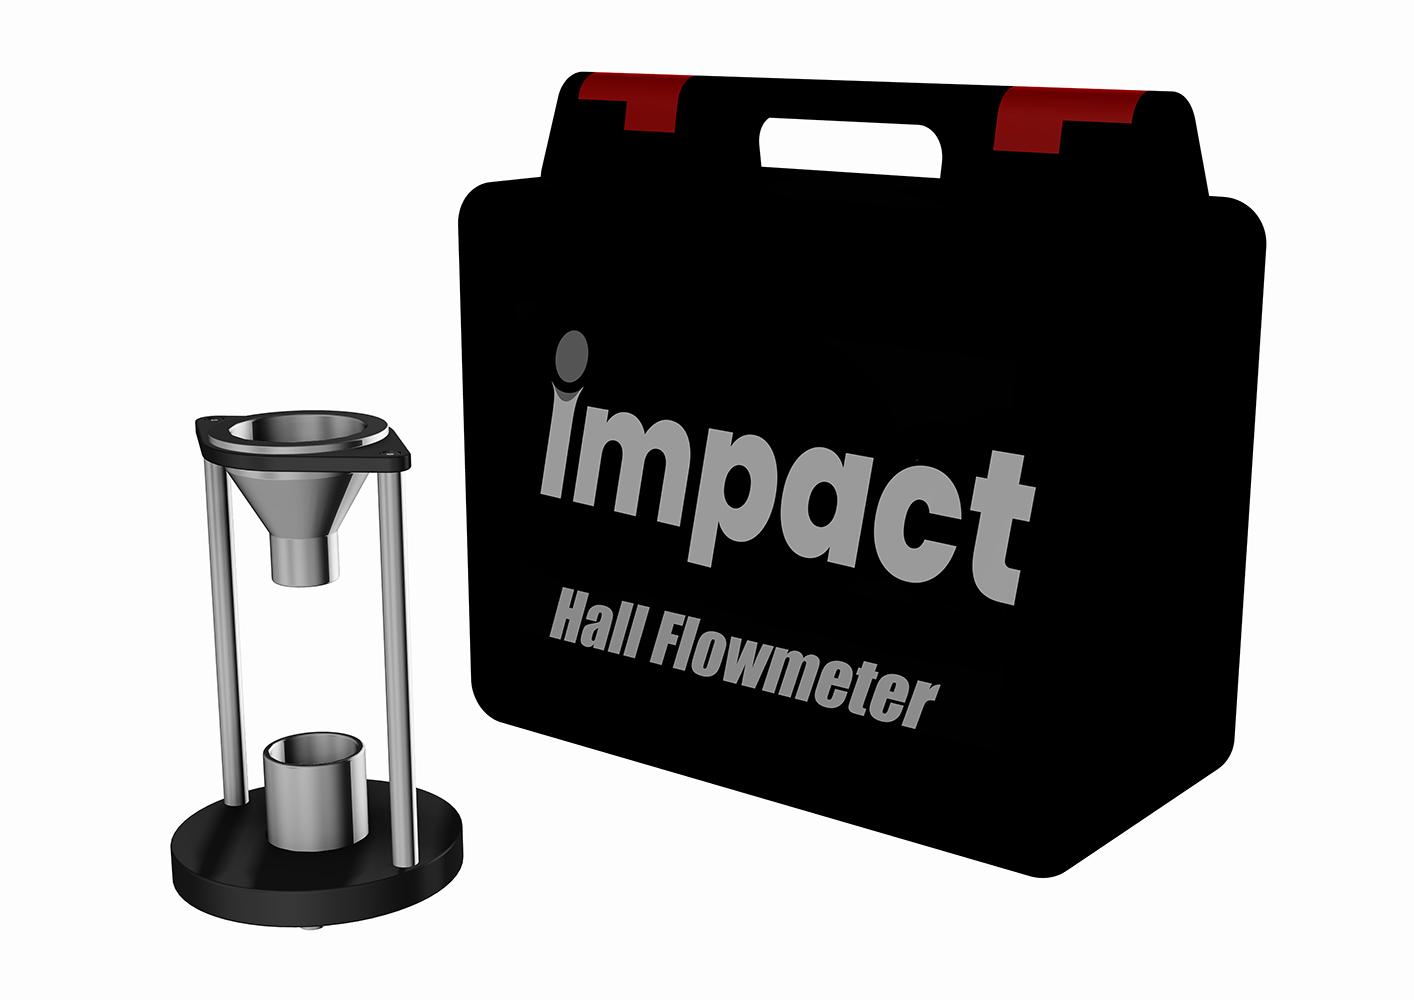 Cold Spray Equipment hall flowmeter kit